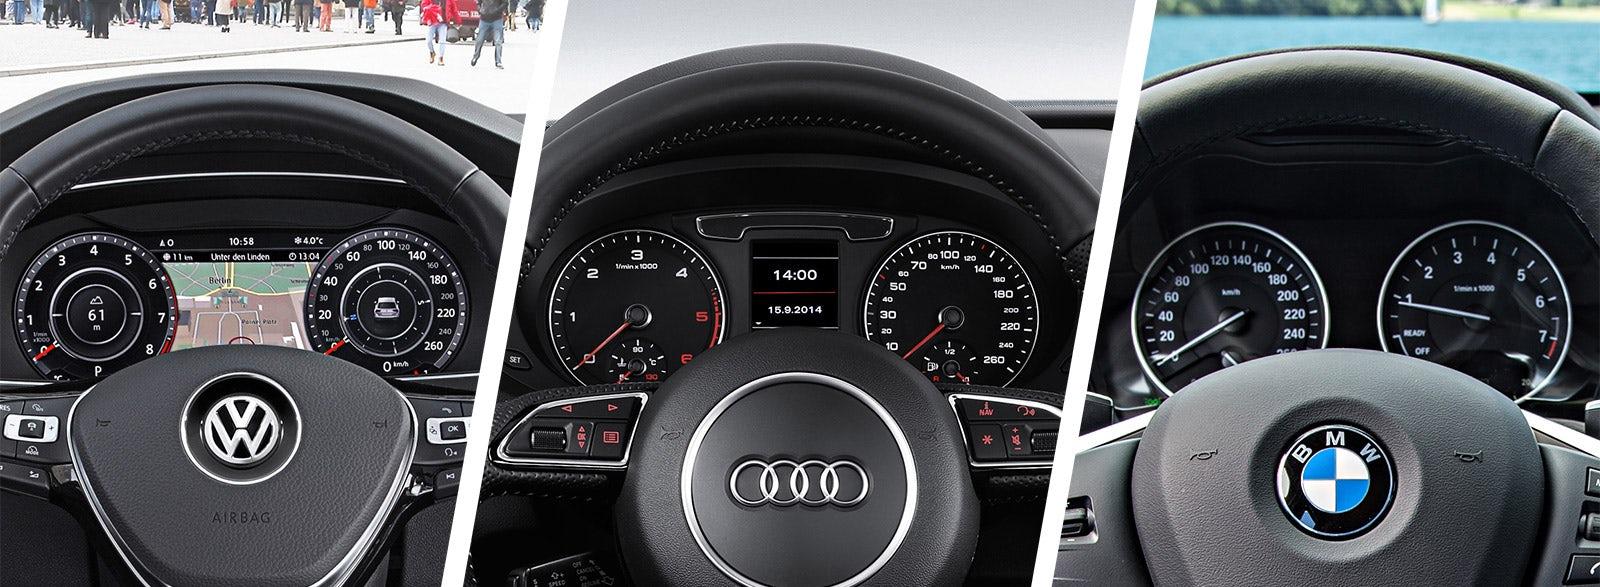 Audi Q3 Vs Vw Tiguan Bmw X1 Dials And Gauges Dashboard